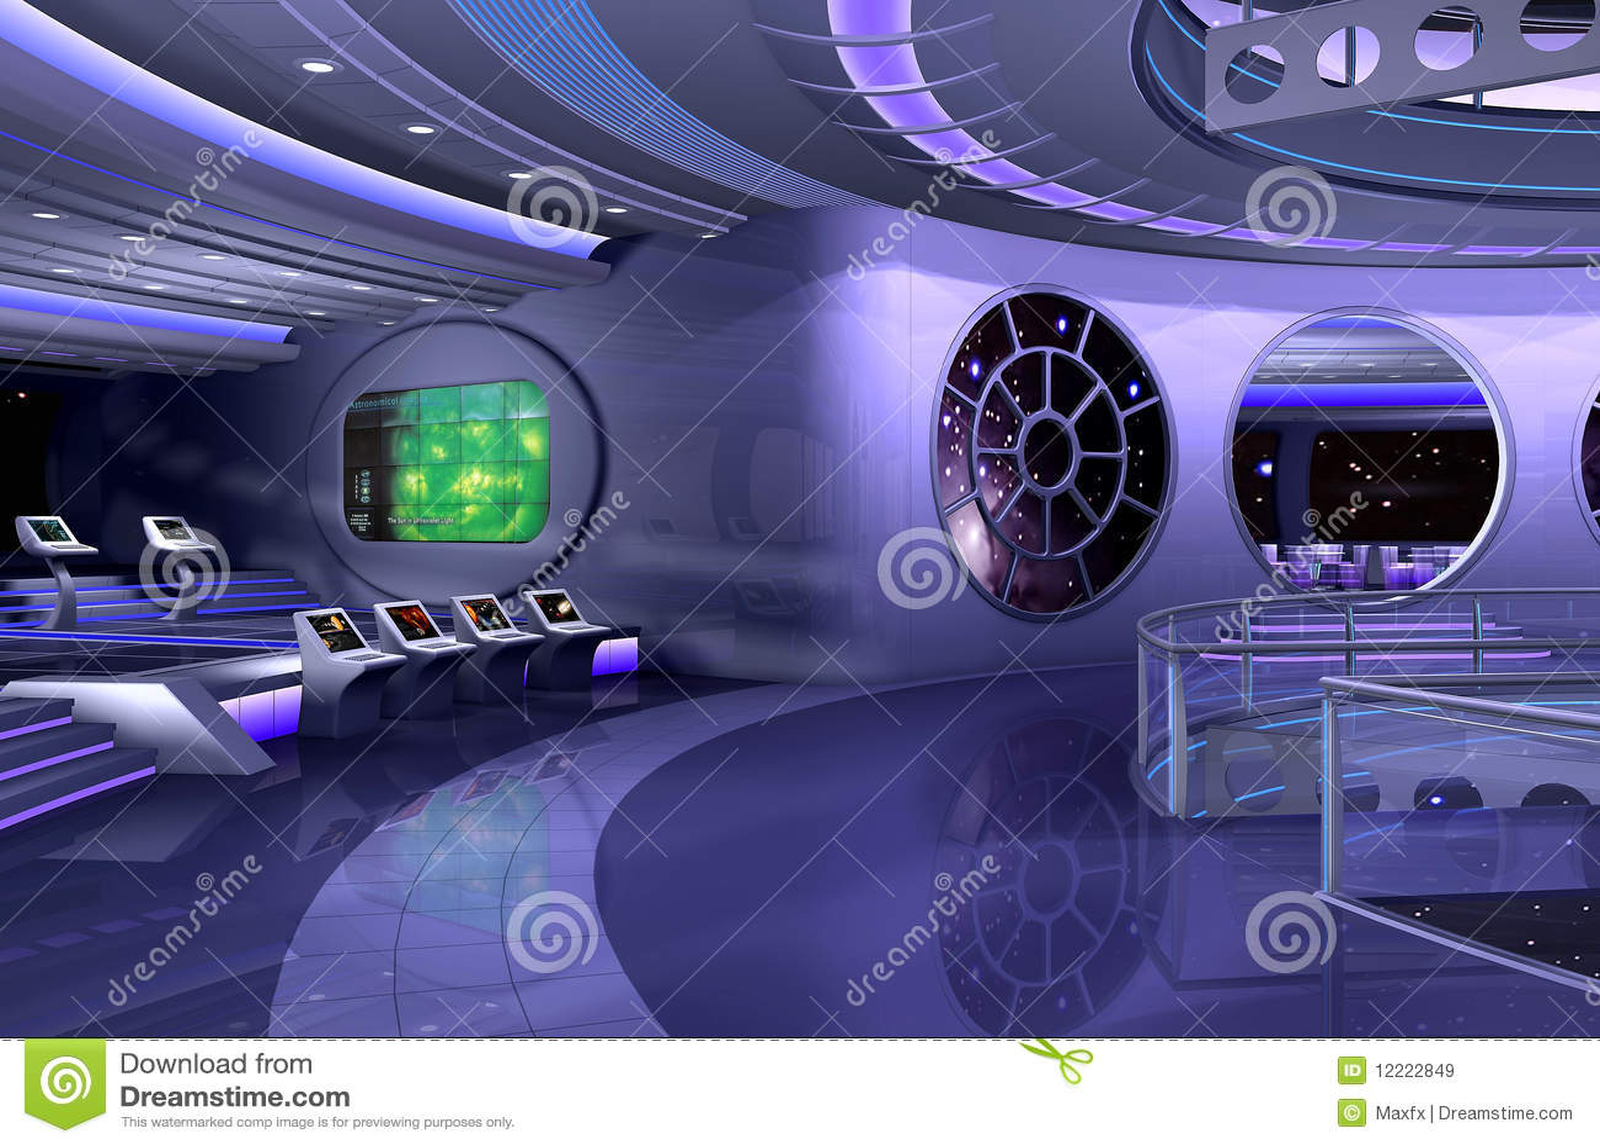 3d spaceship interior stock illustration illustration of technologic 12222849. Black Bedroom Furniture Sets. Home Design Ideas